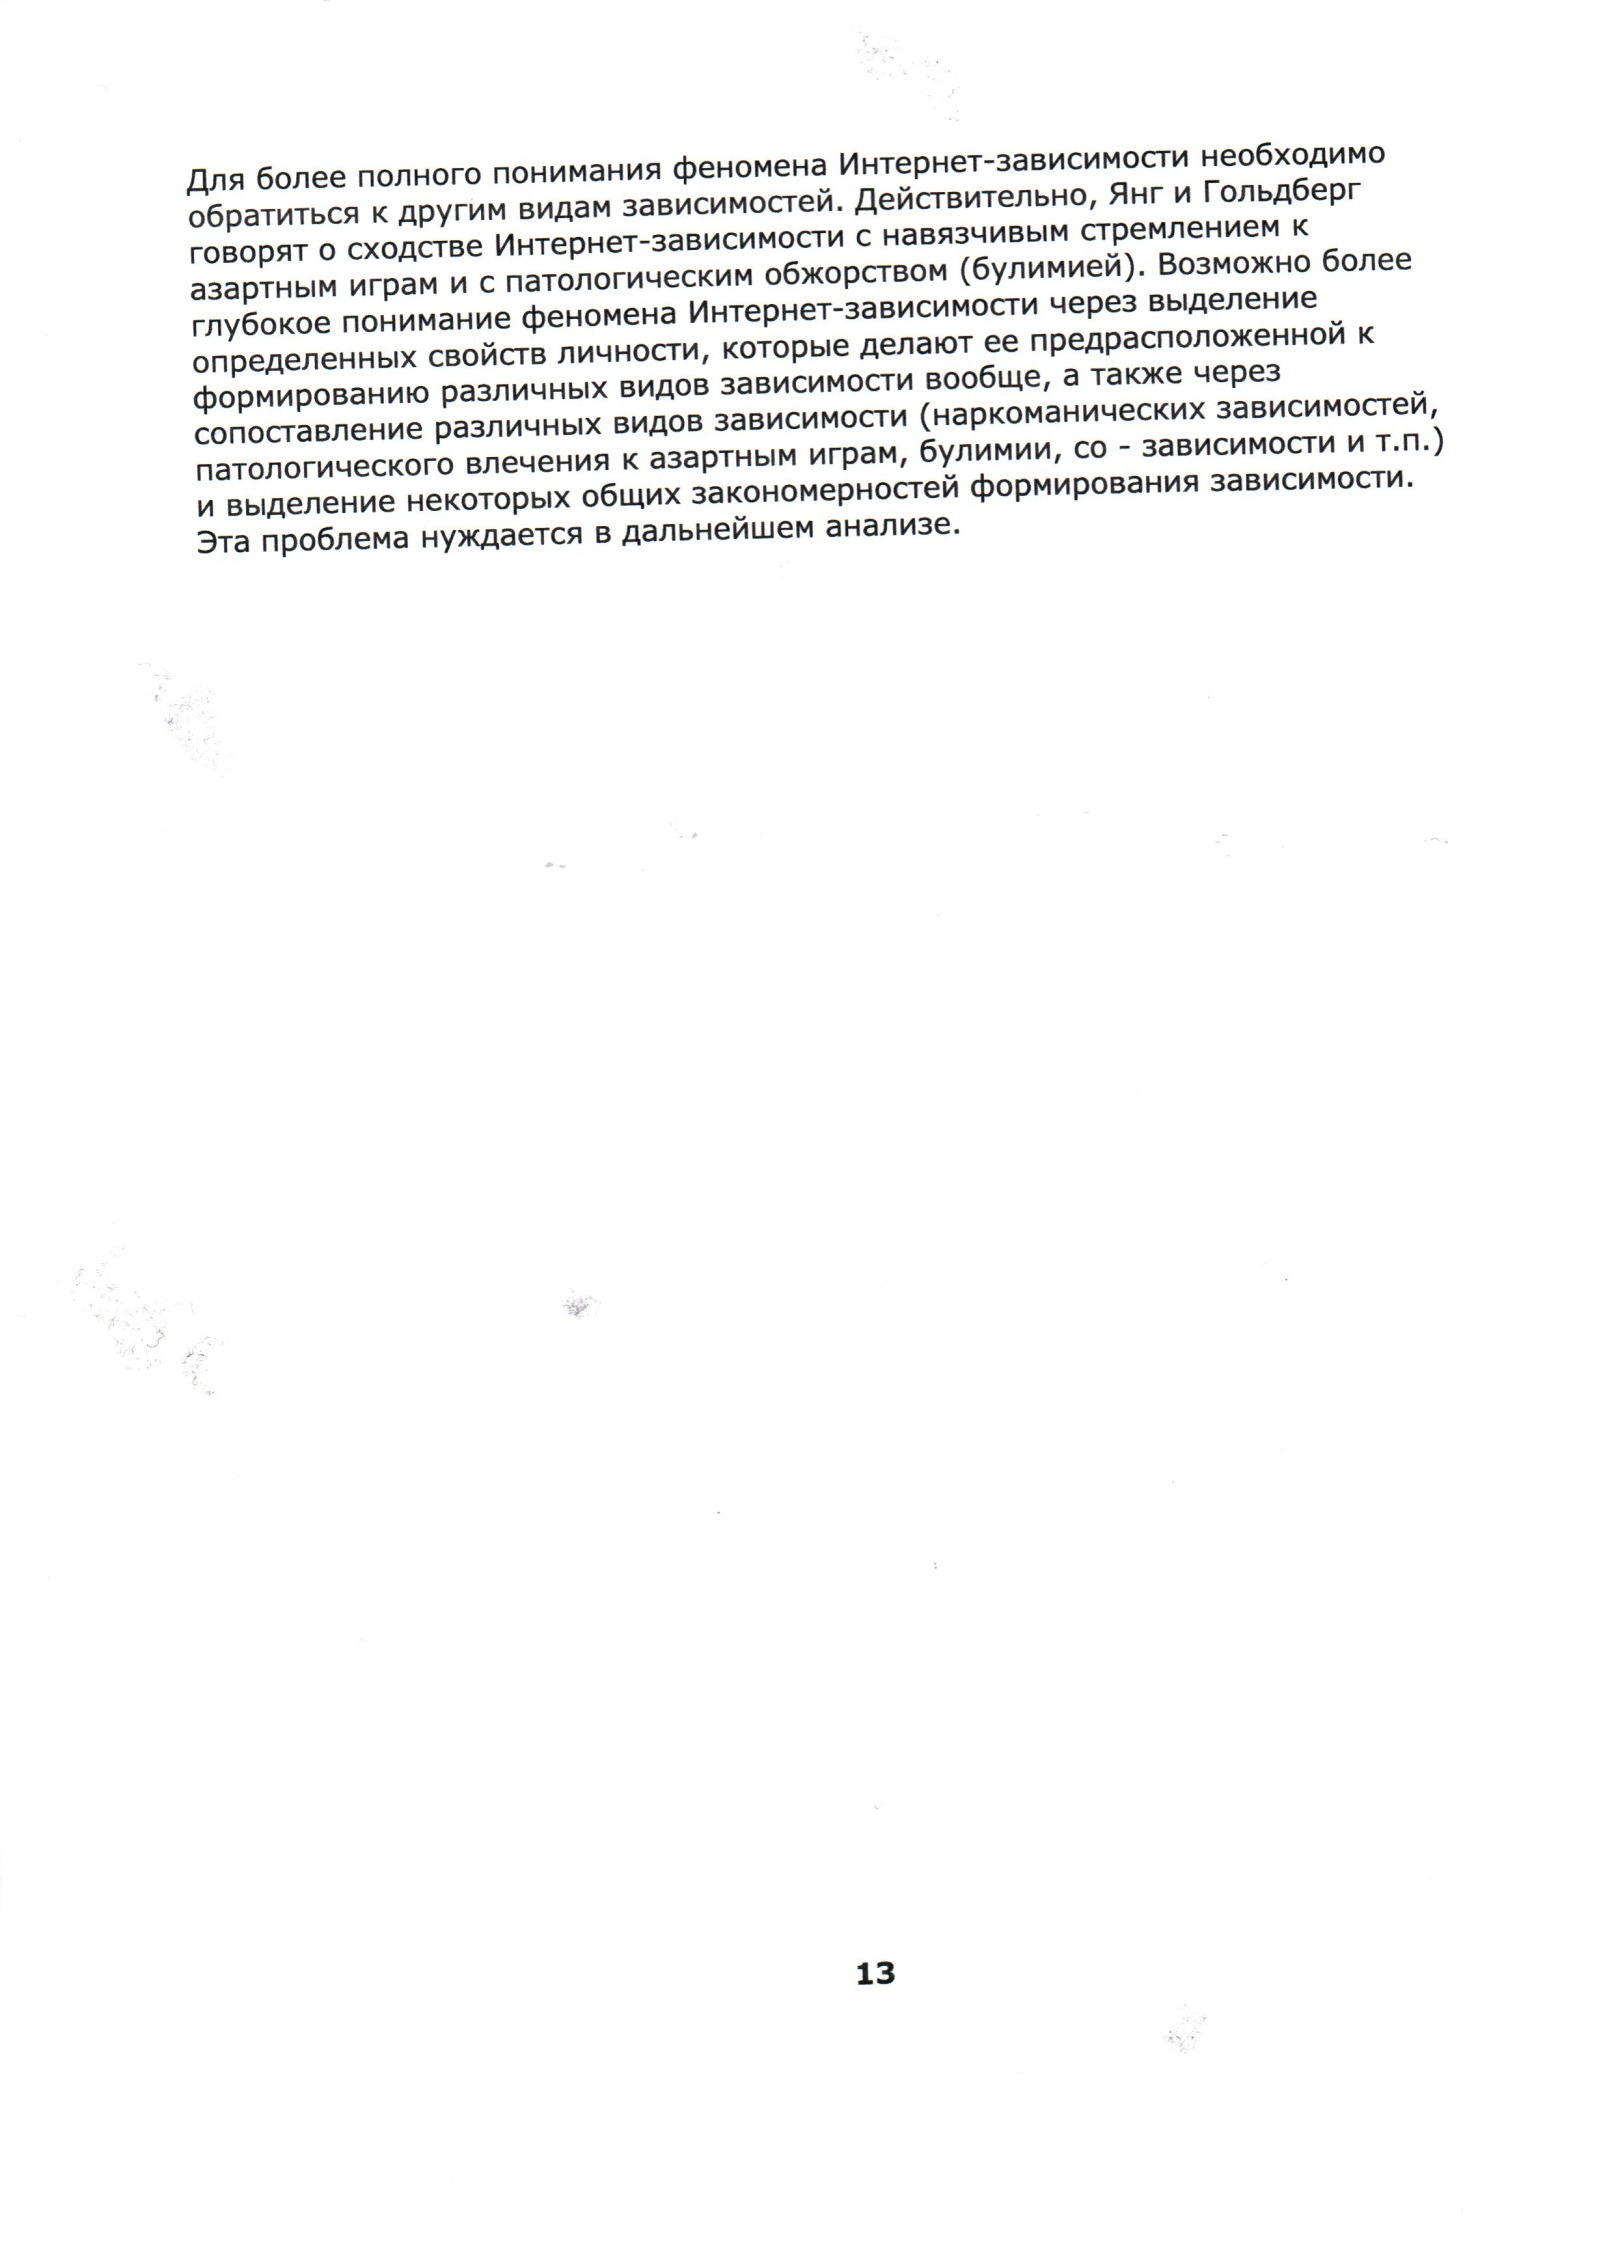 C:\Users\Ирина\Documents\Panasonic\MFS\Scan\20160225_105230.jpg